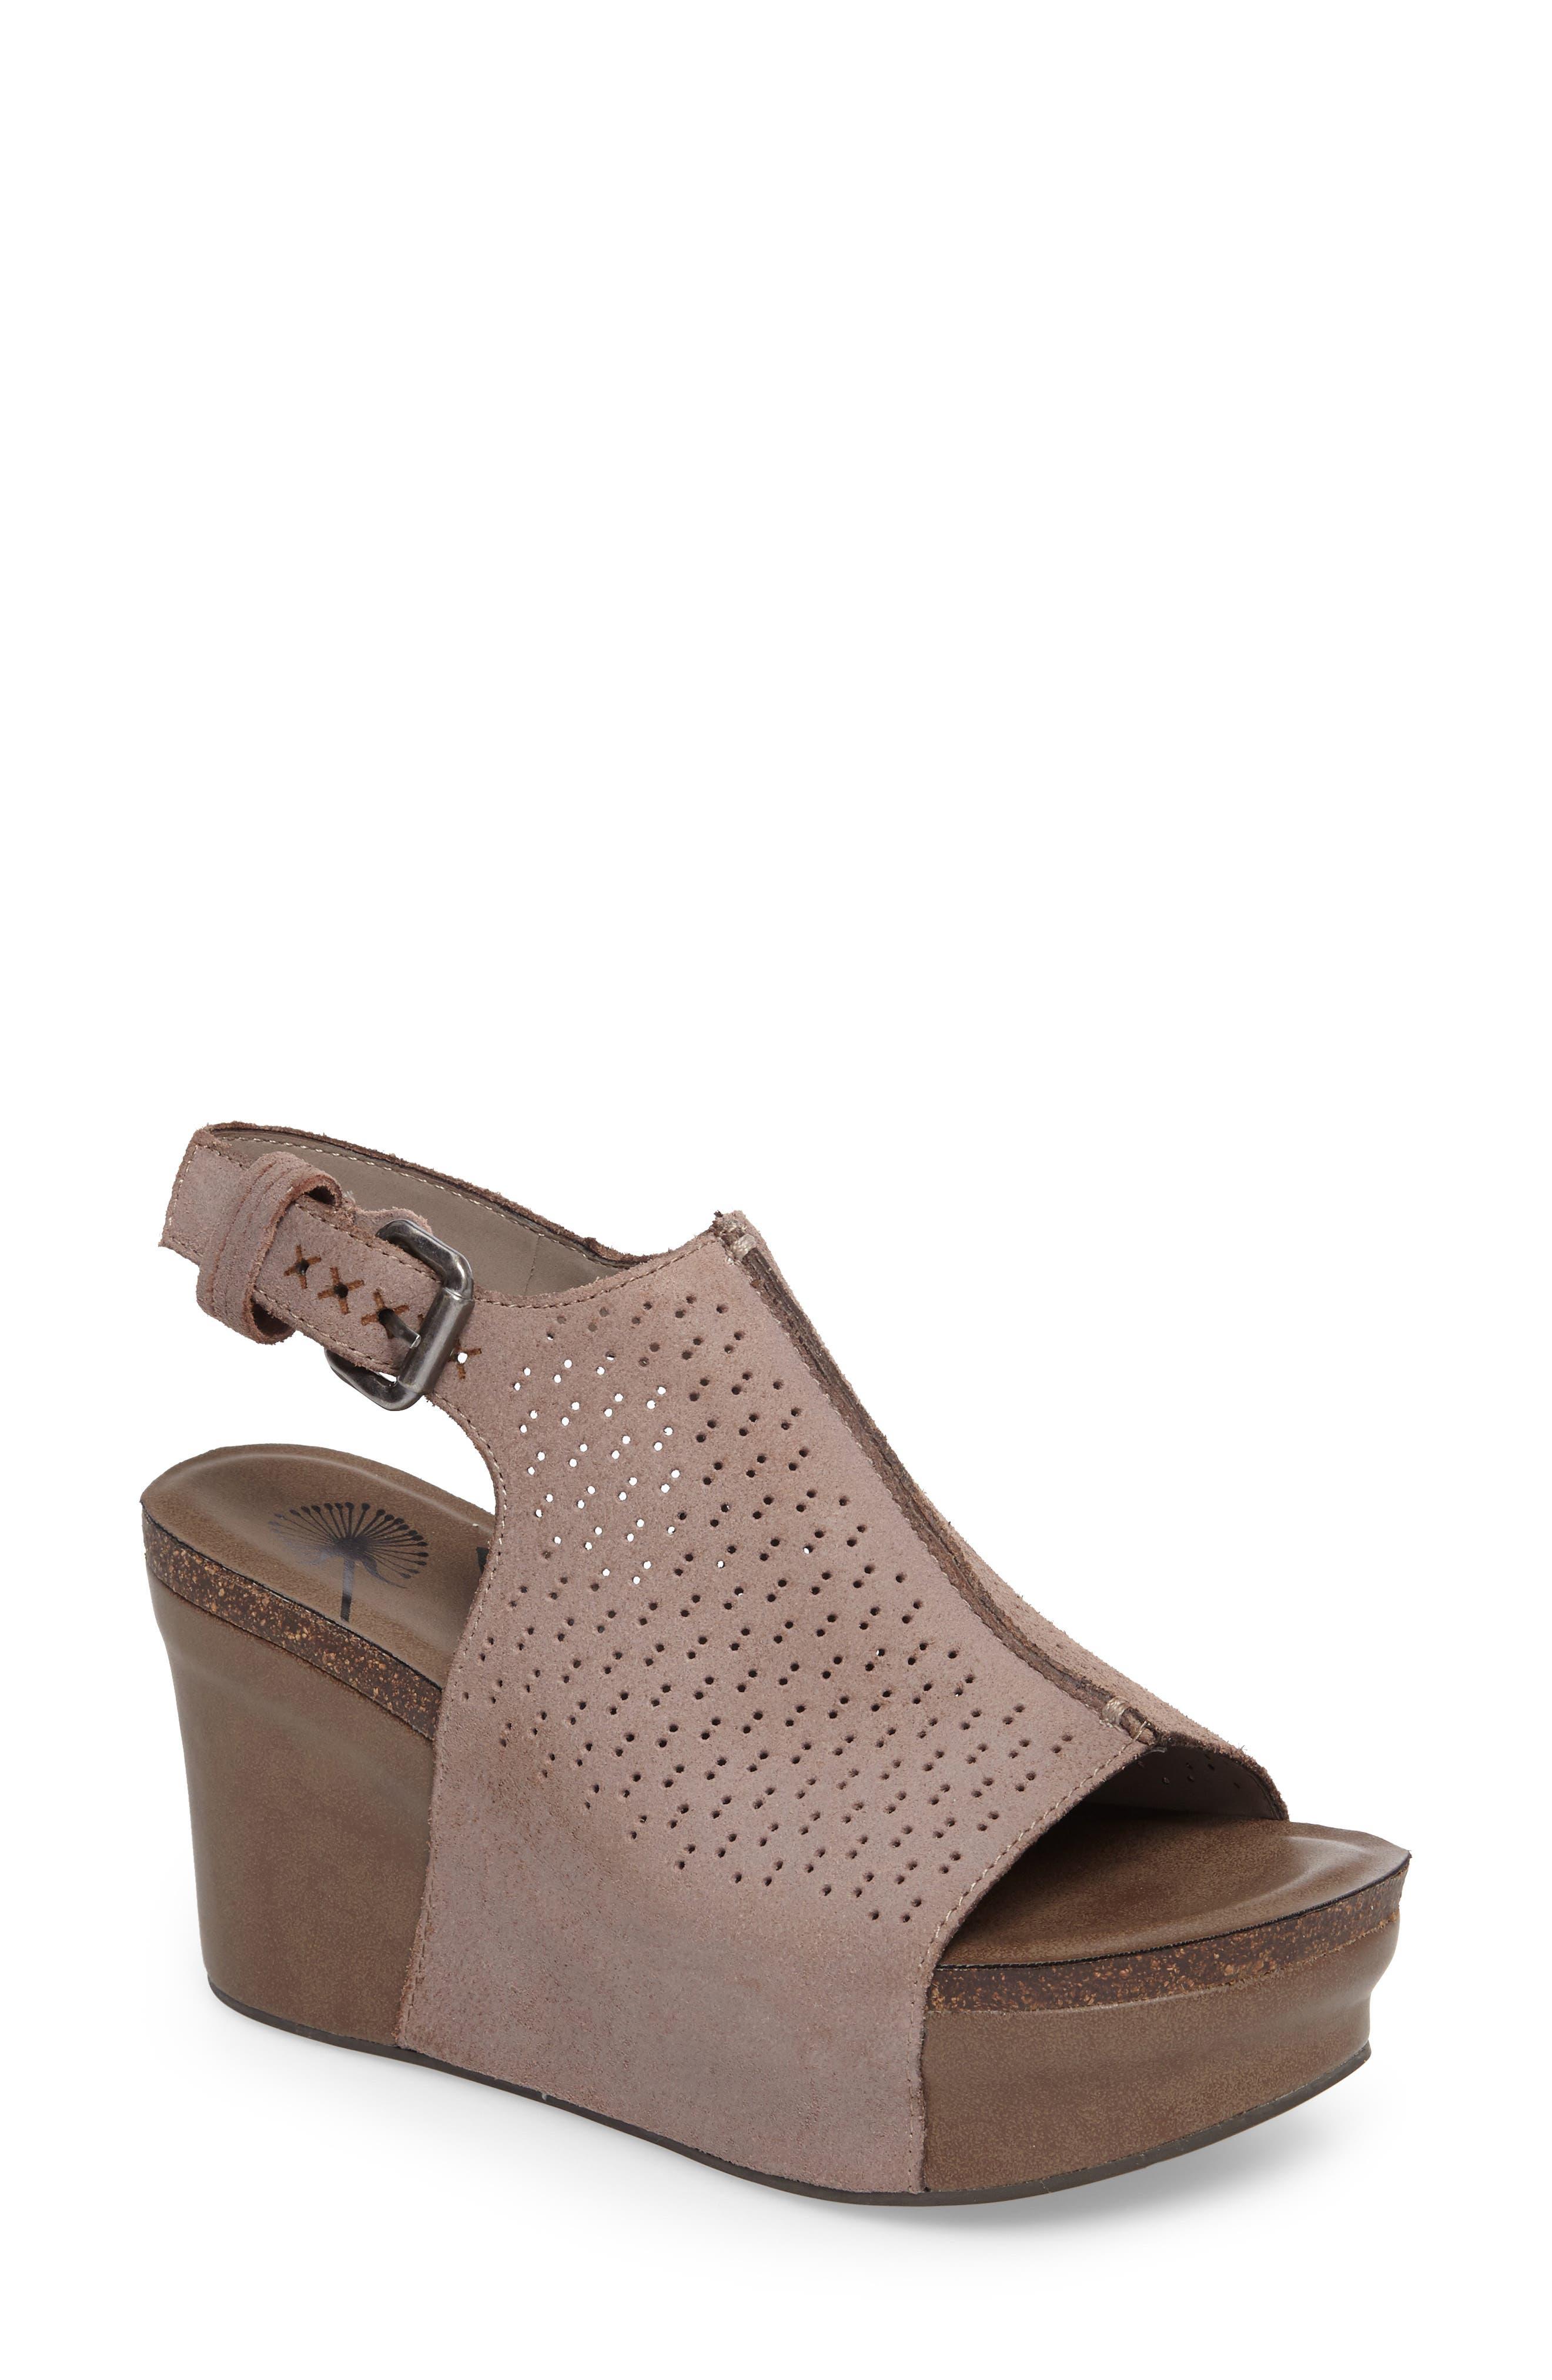 OTBT, Jaunt Platform Wedge Sandal, Main thumbnail 1, color, GREY POWDER SUEDE